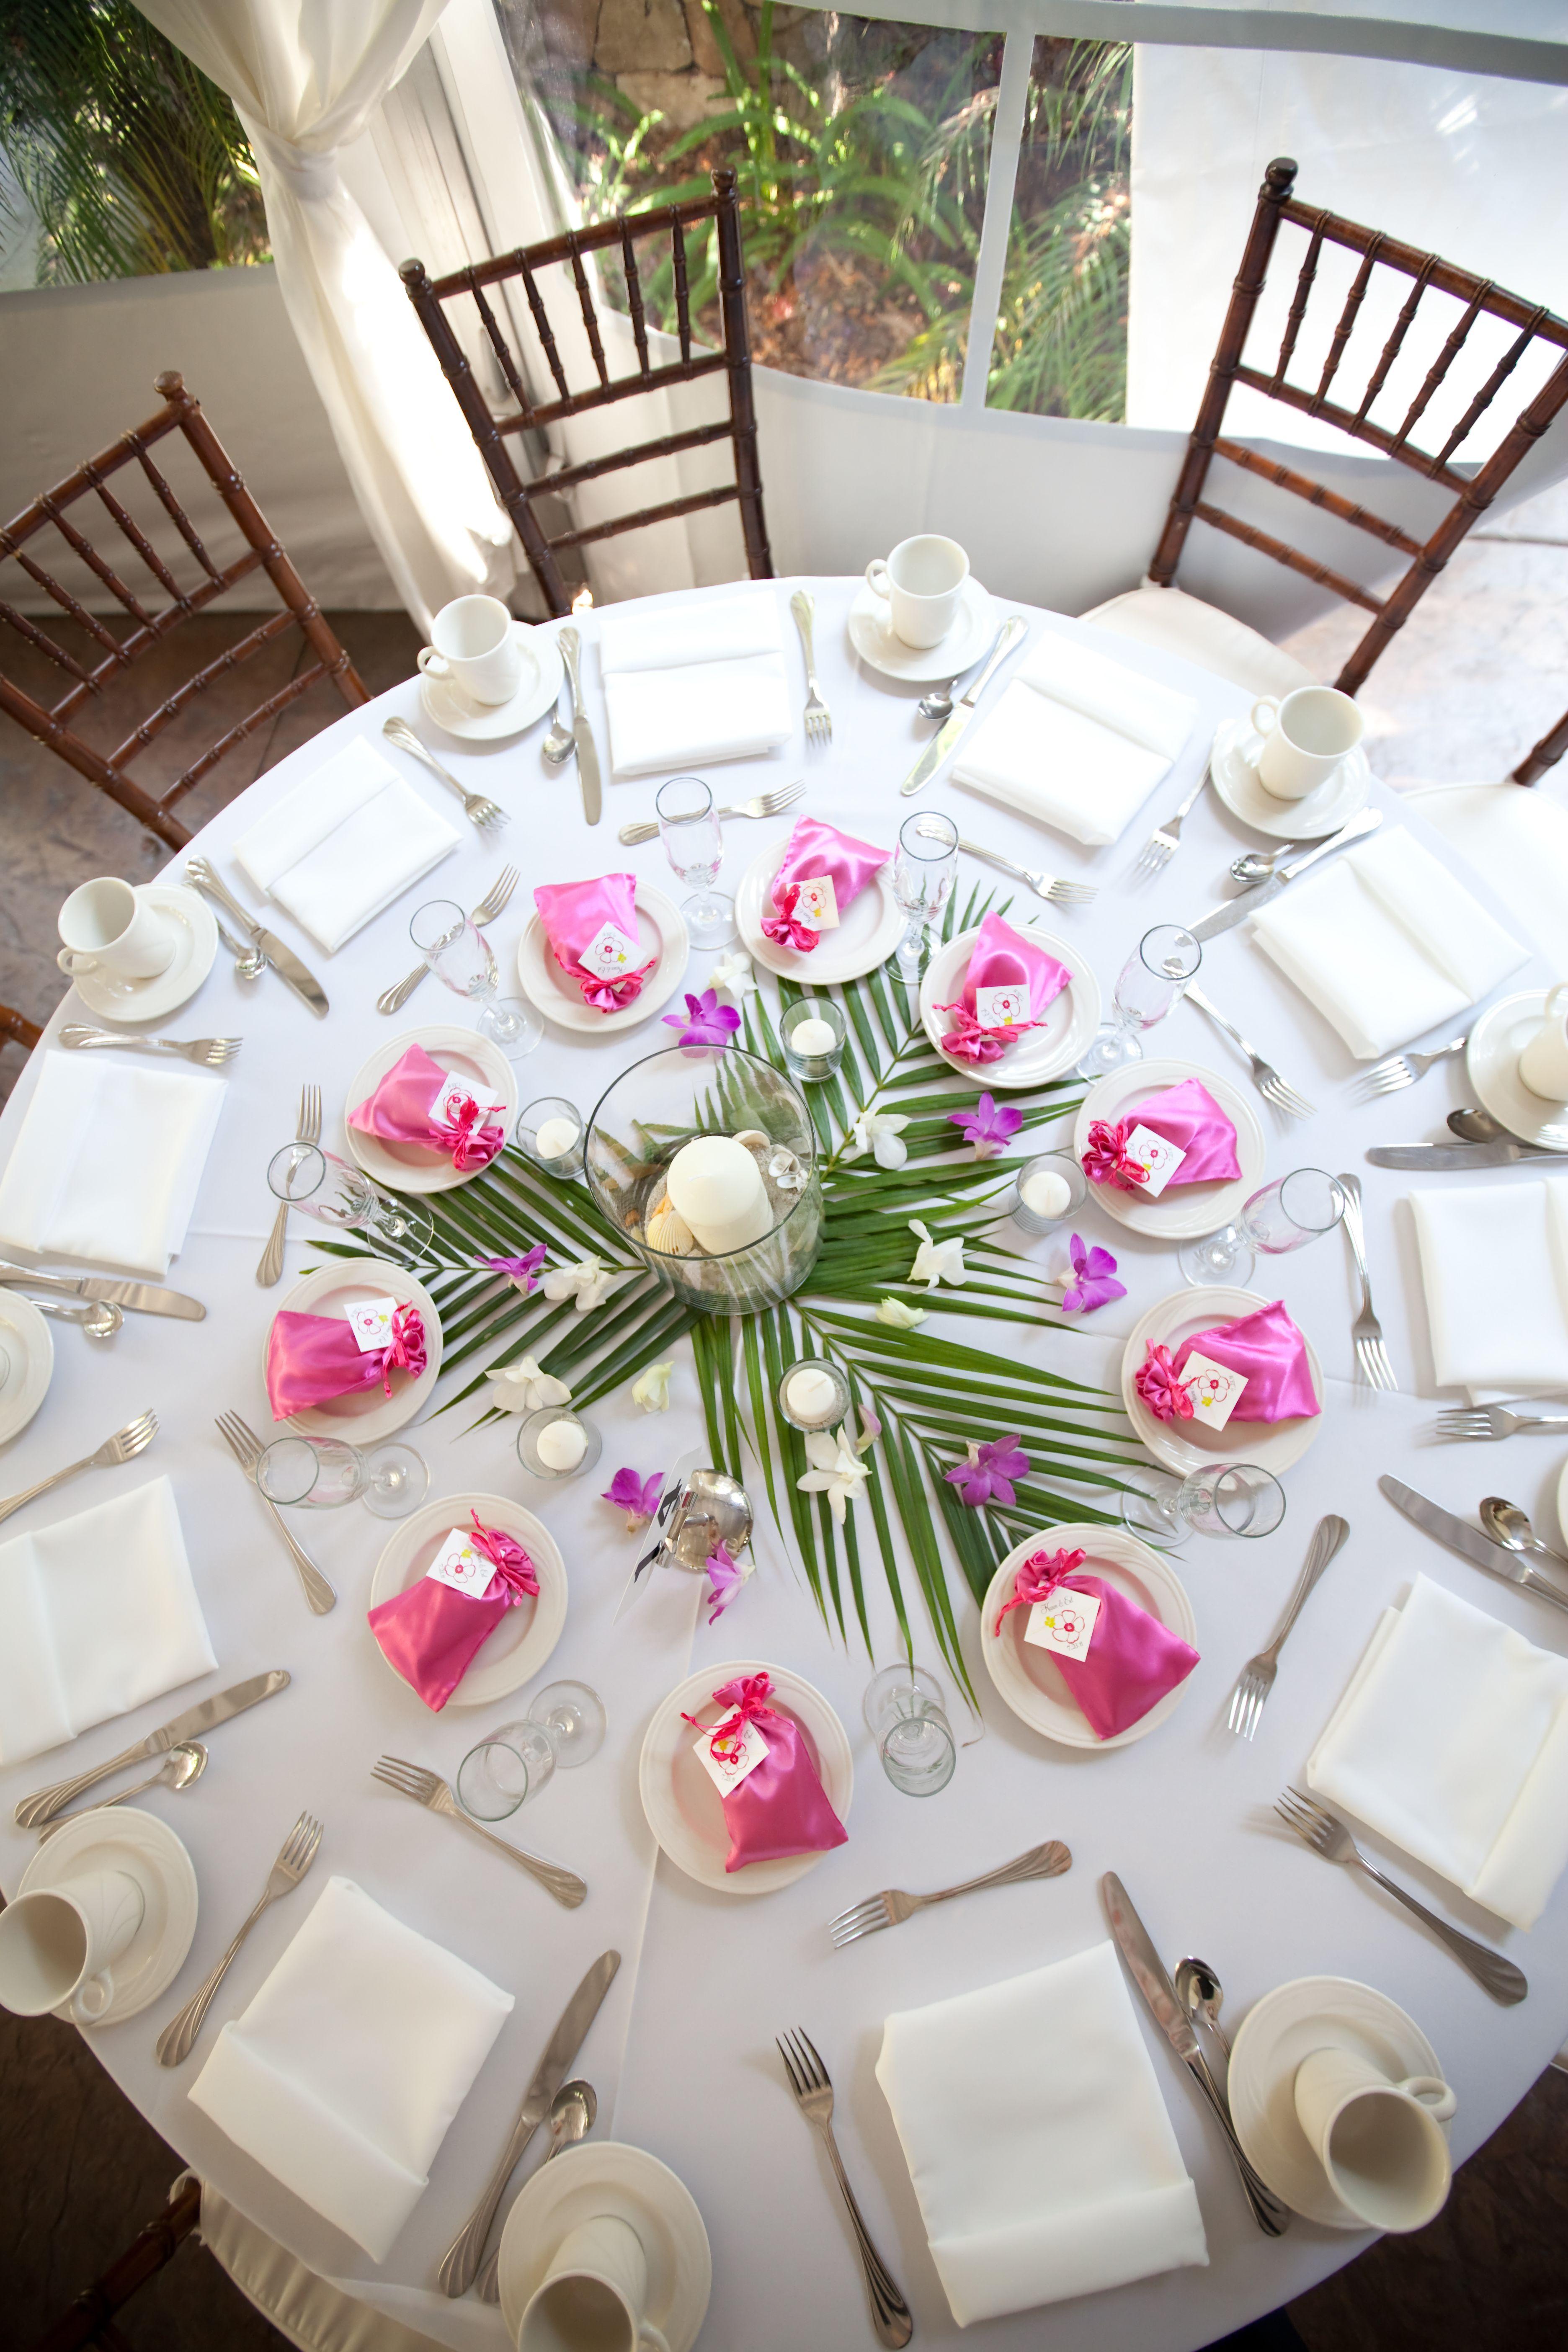 Wedding decoration ideas centerpieces  Tropical tablescape with simple yet fun centerpieces  Beach